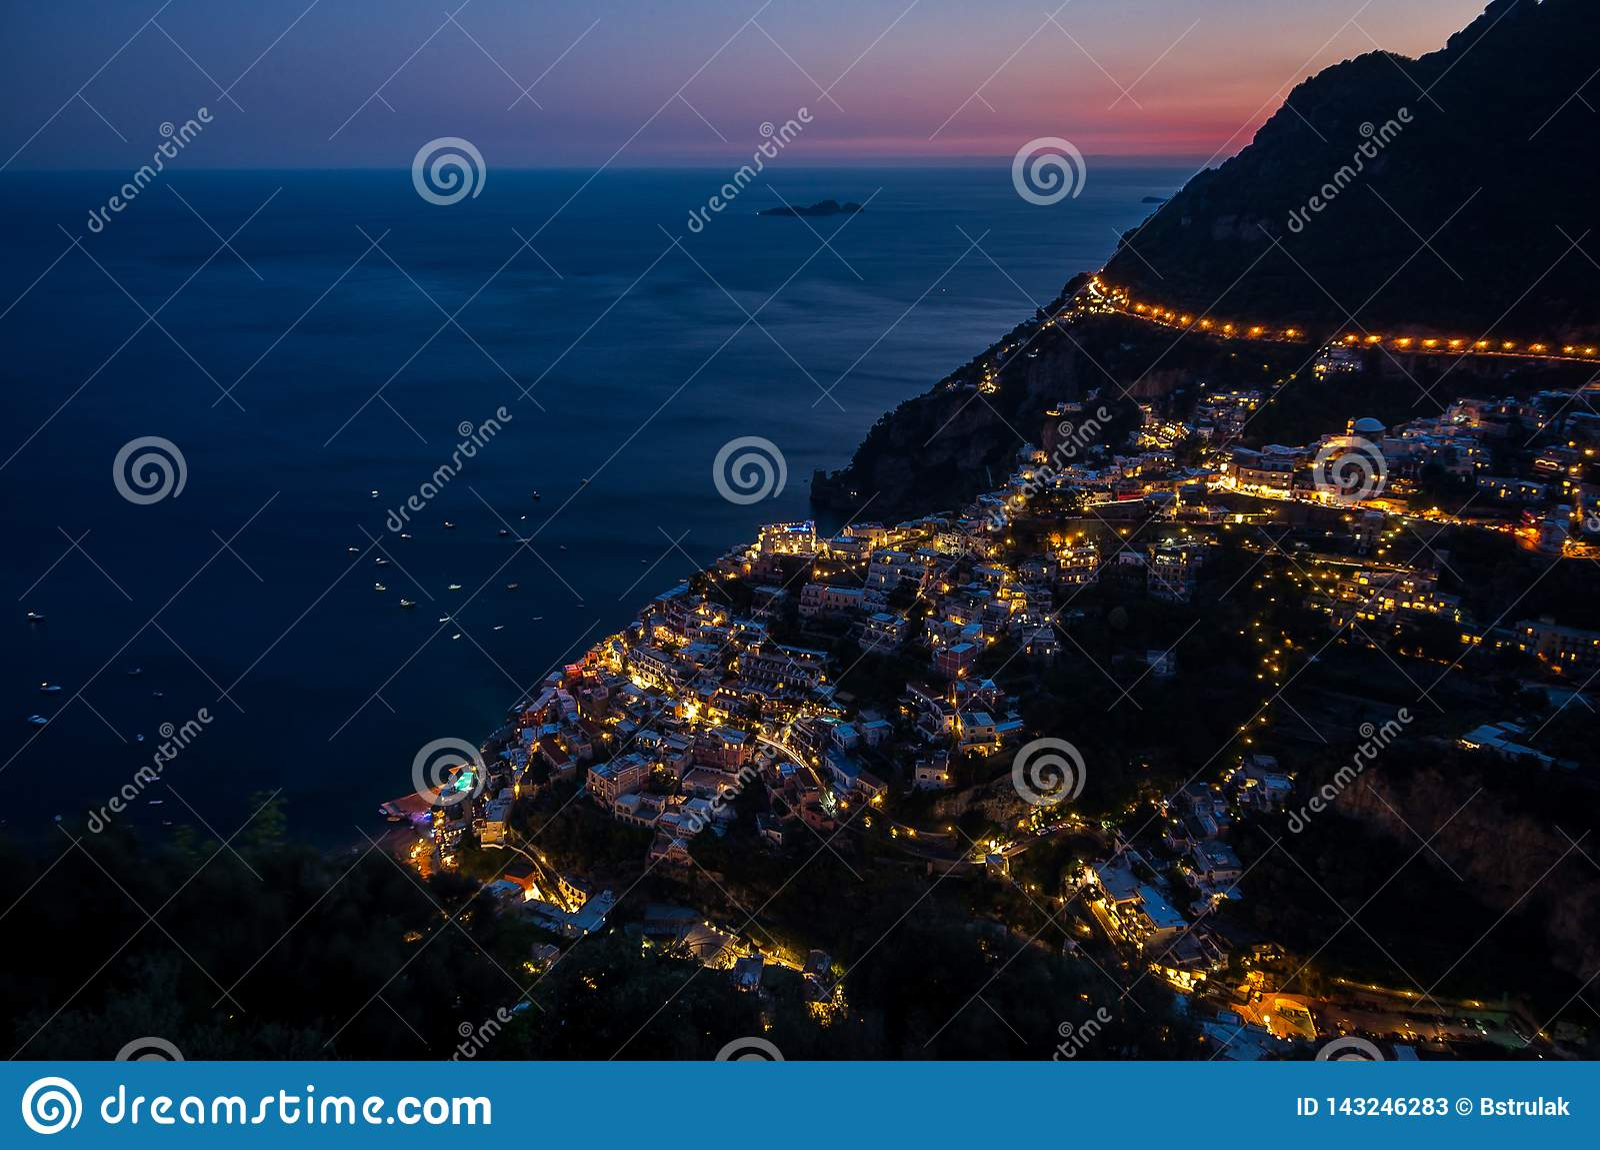 Panorama of beautiful coastal town - Positano by Amalfi Coast in Italy during sunset, Positano, Italy